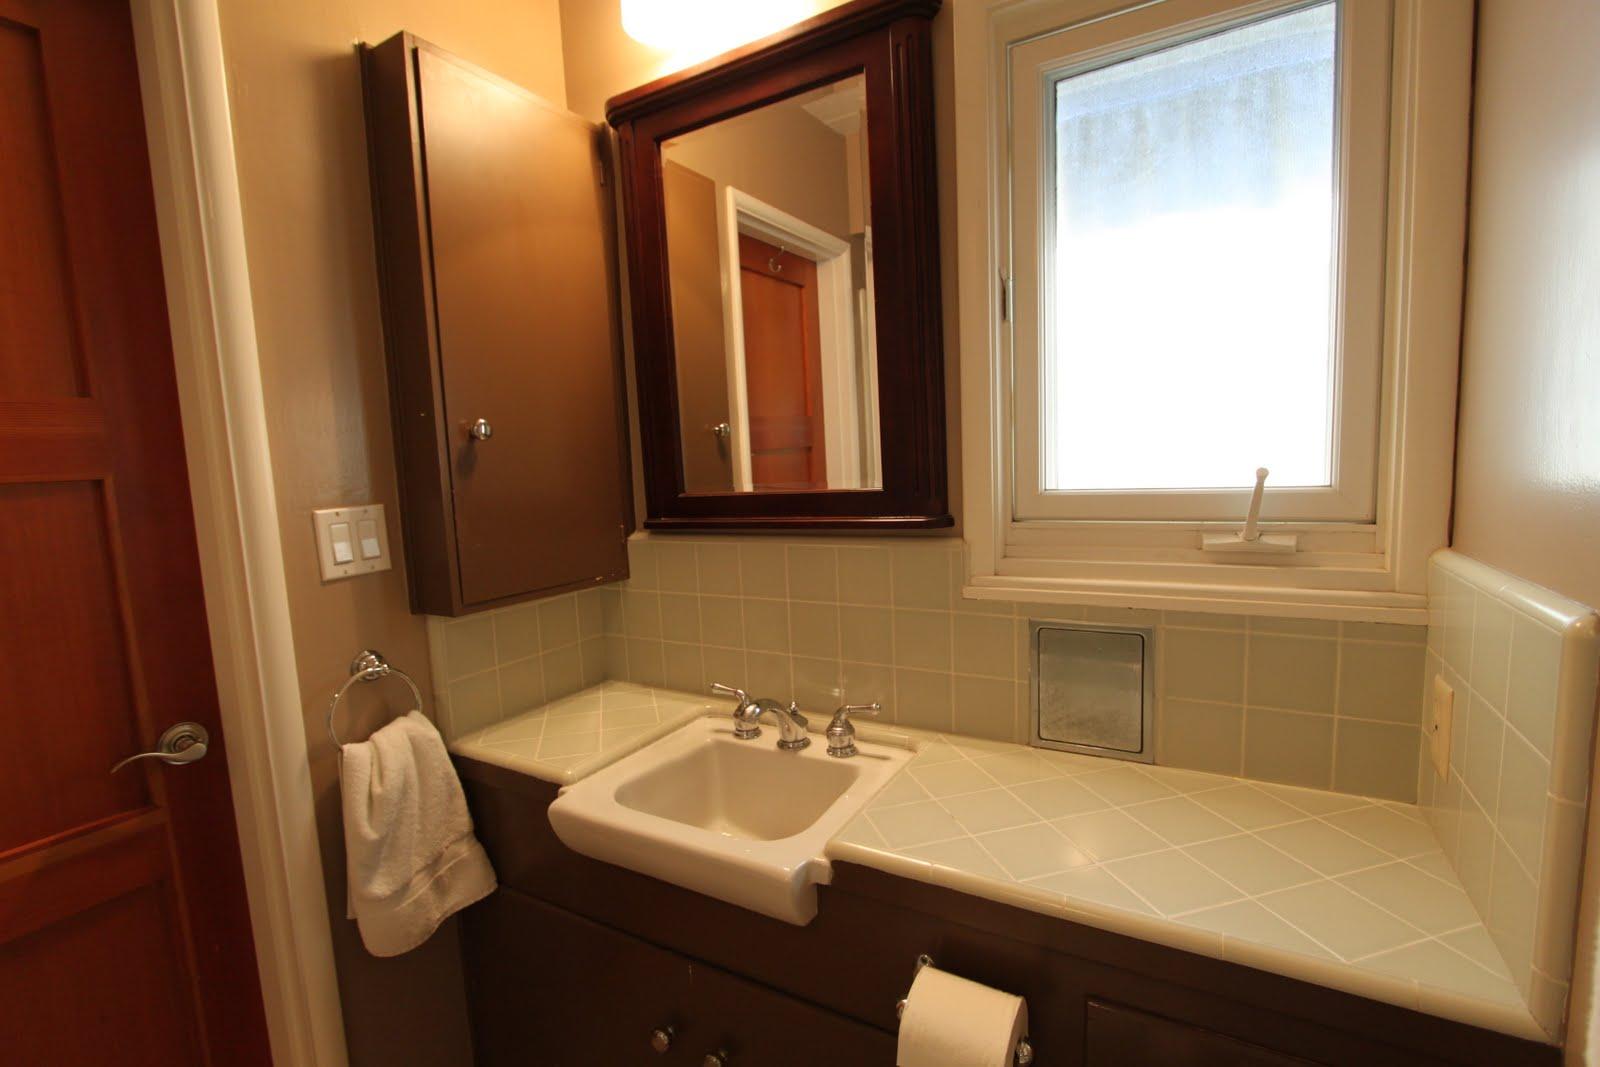 Modern Bathroom: 3 Mid-century Bathrooms Remodeled